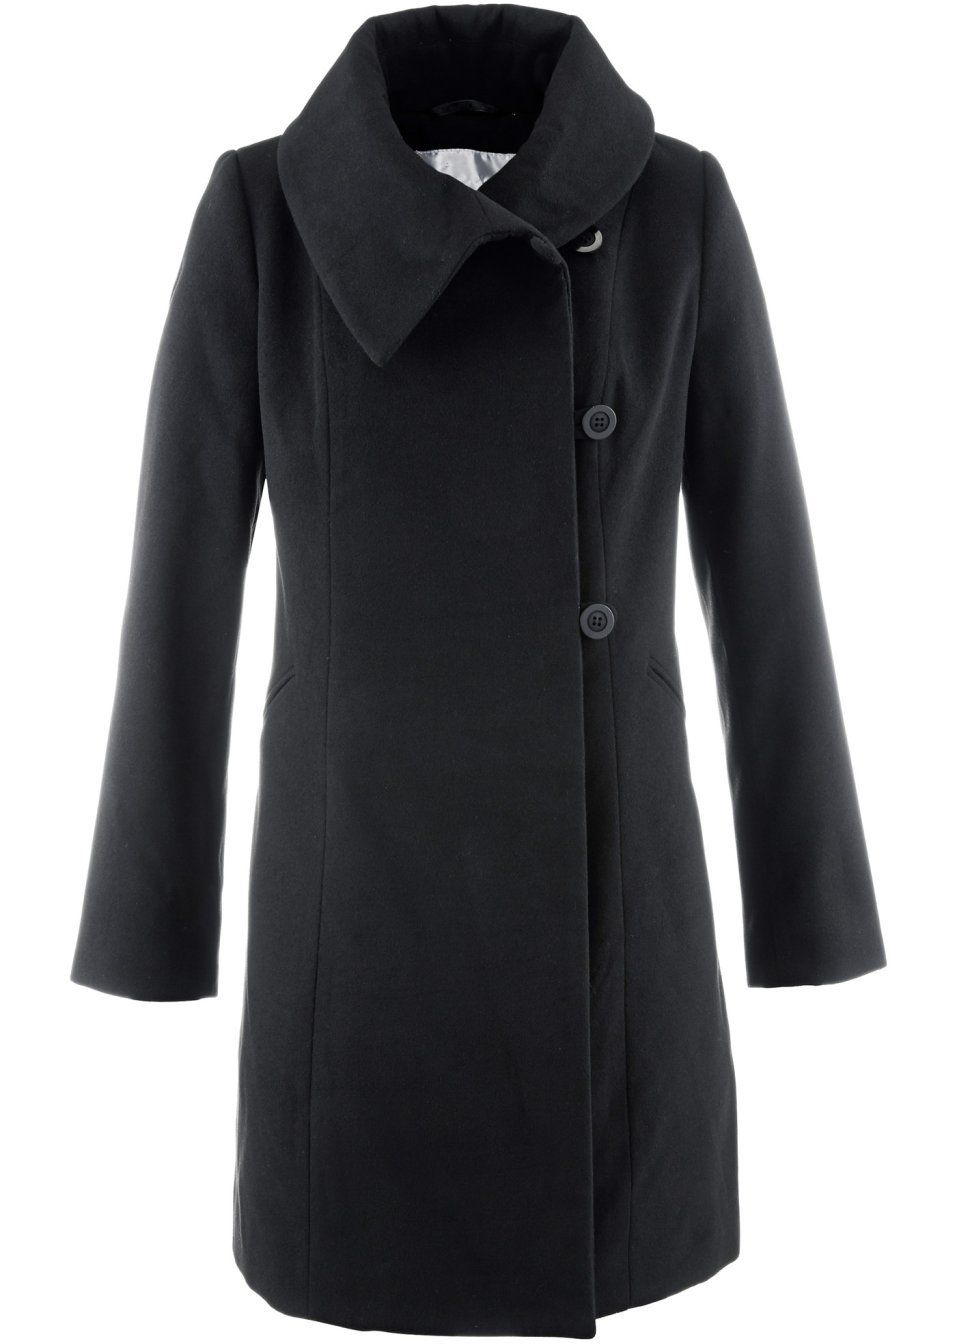 Plaszcz Coat Fashion Jackets